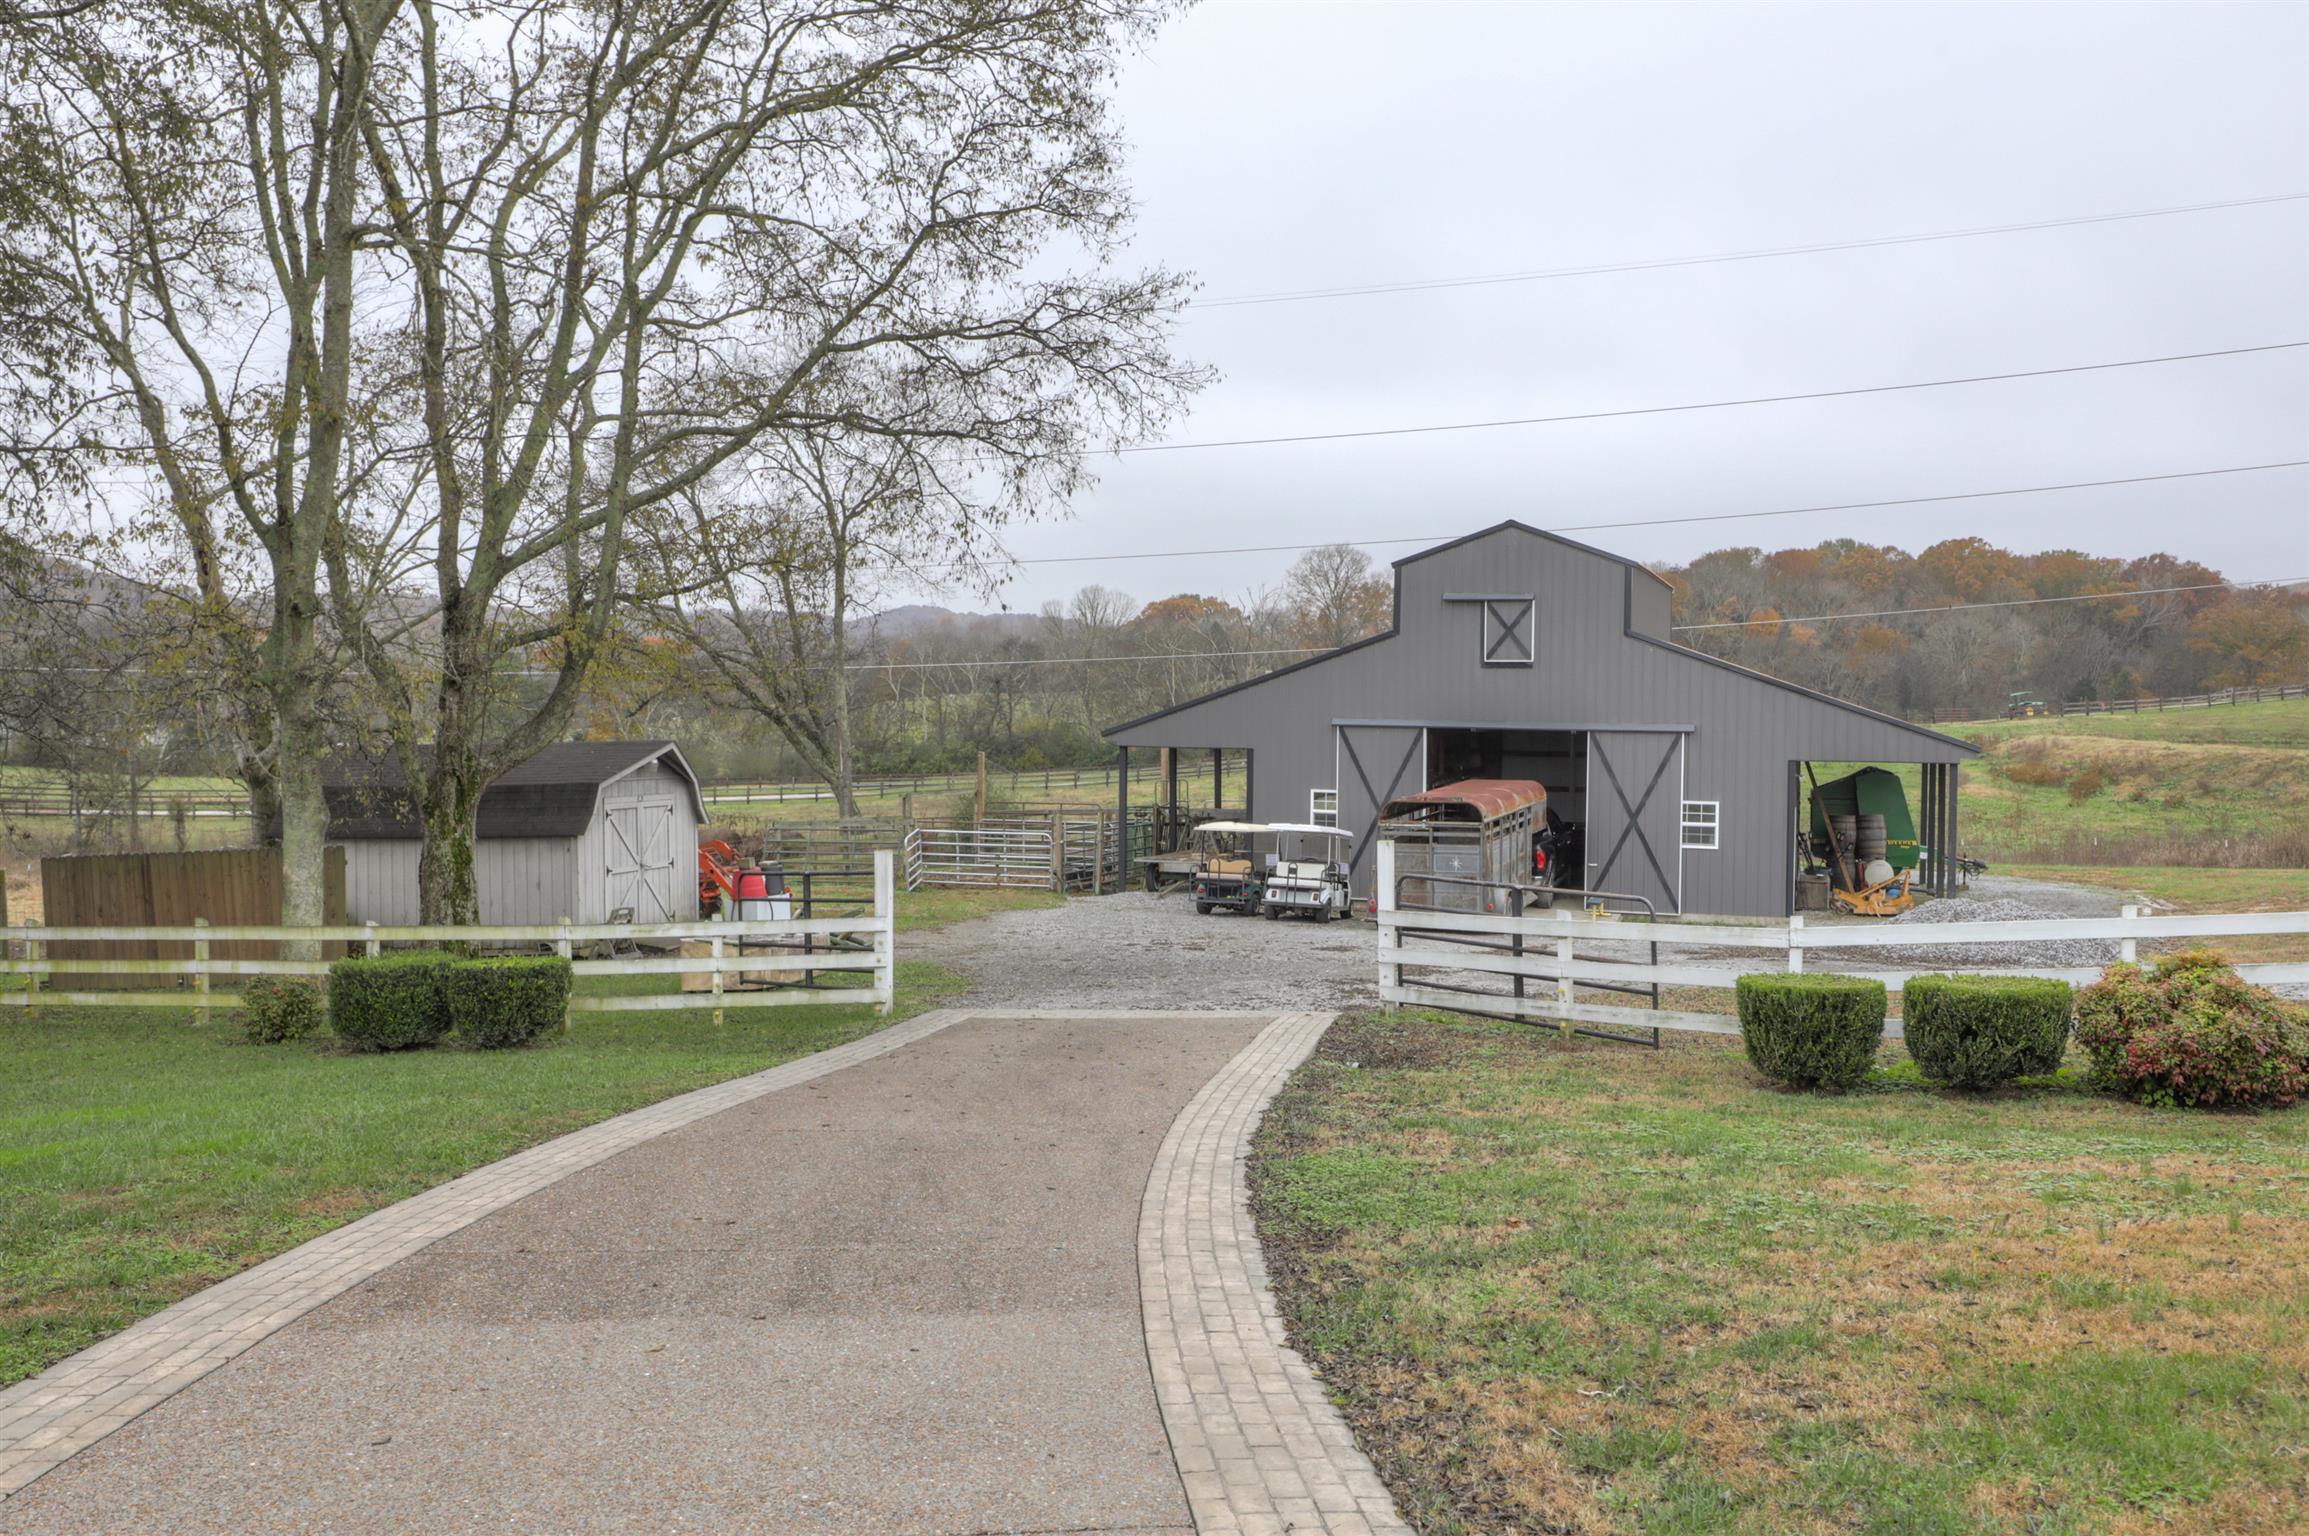 475 Dry Fork Creek Rd, Gallatin, TN 37066 - Gallatin, TN real estate listing